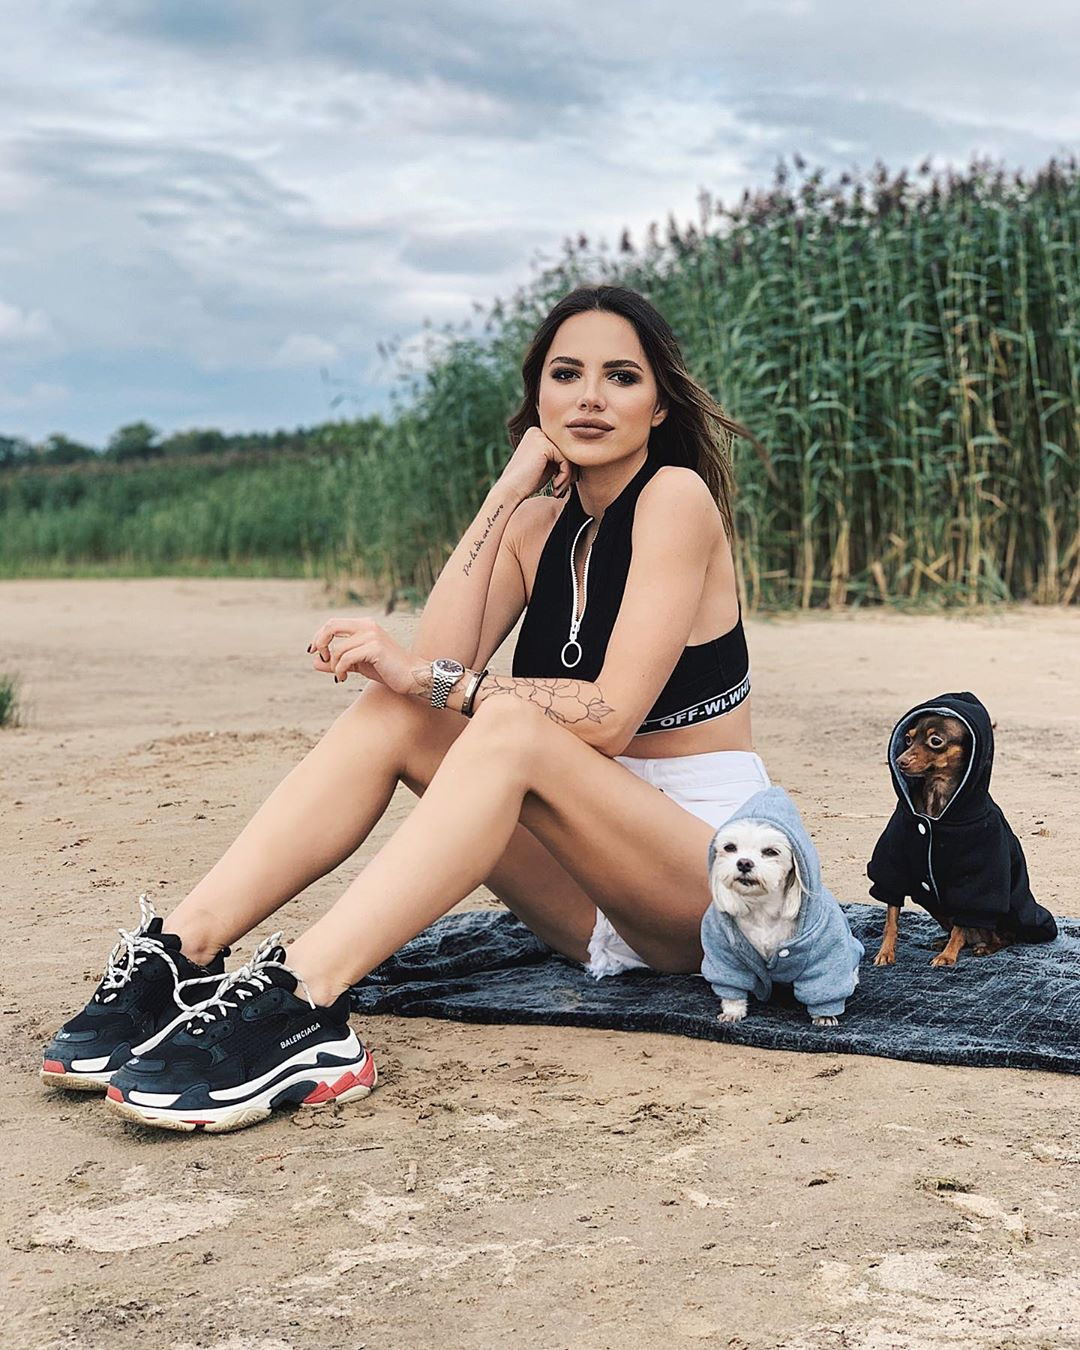 Лиза Шатилова с собаками